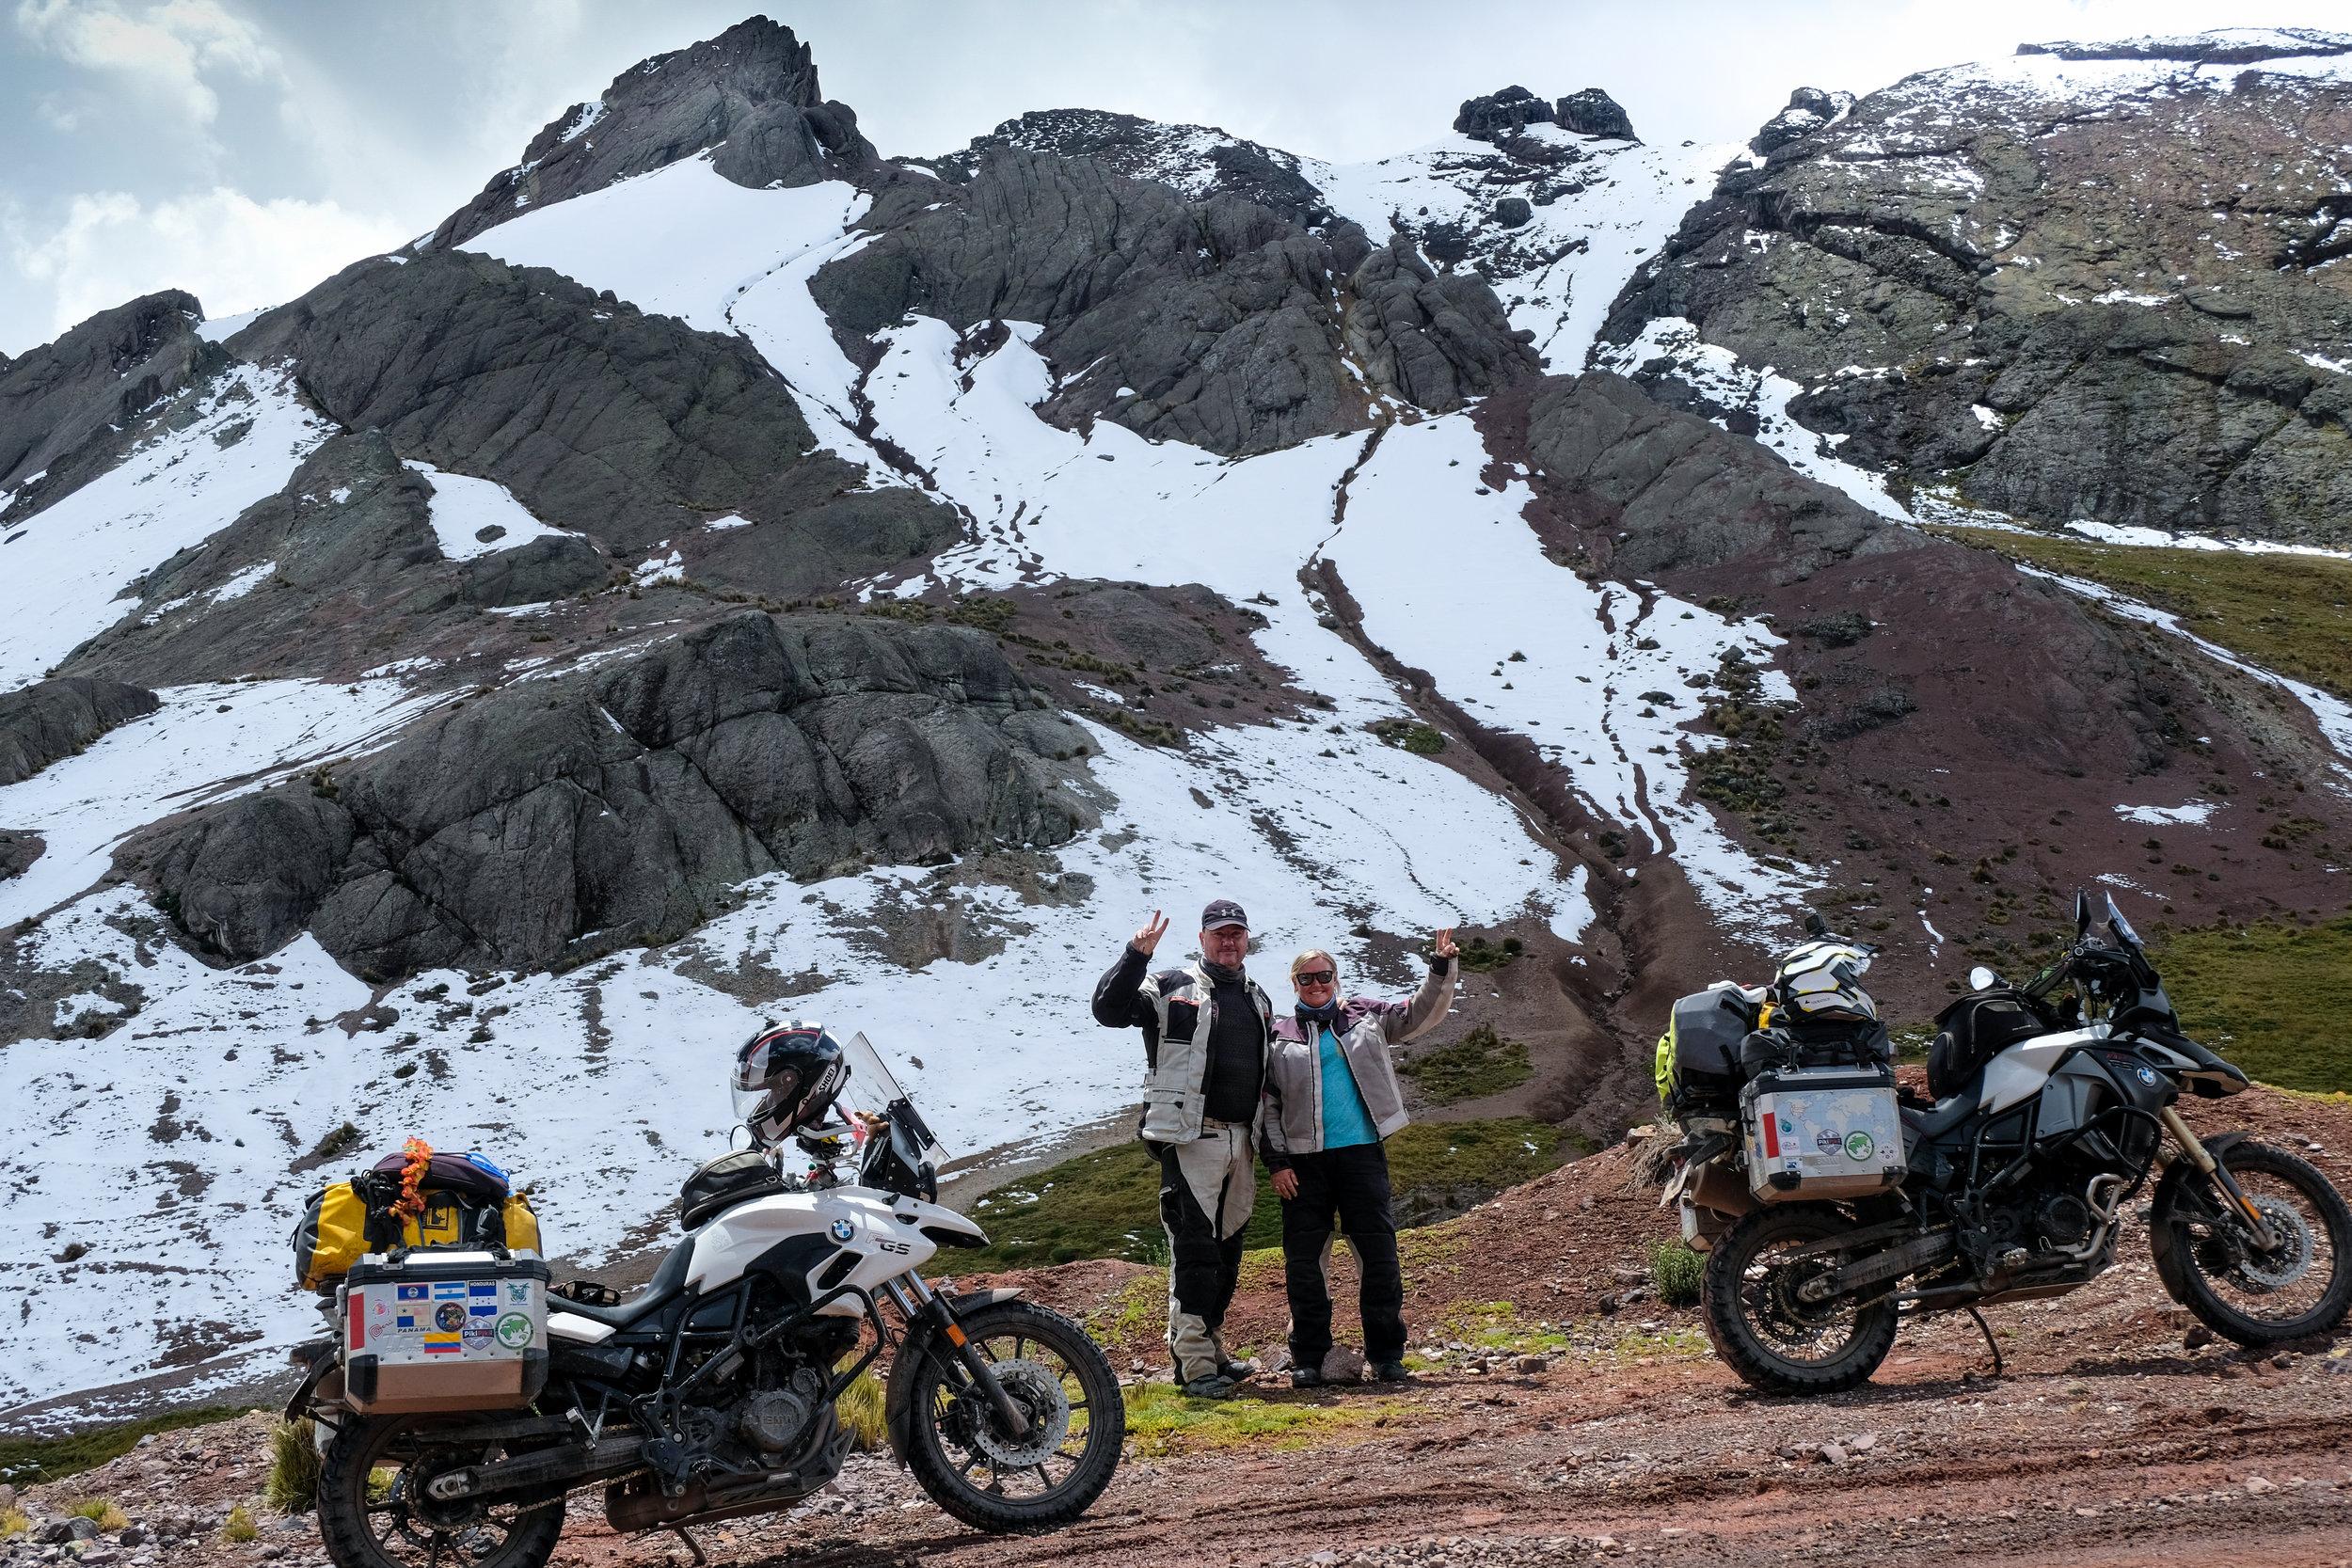 Paul-Neake-Hannaby-Adventure-Rider-Radio-Motorcycle-Podcast-4.jpg